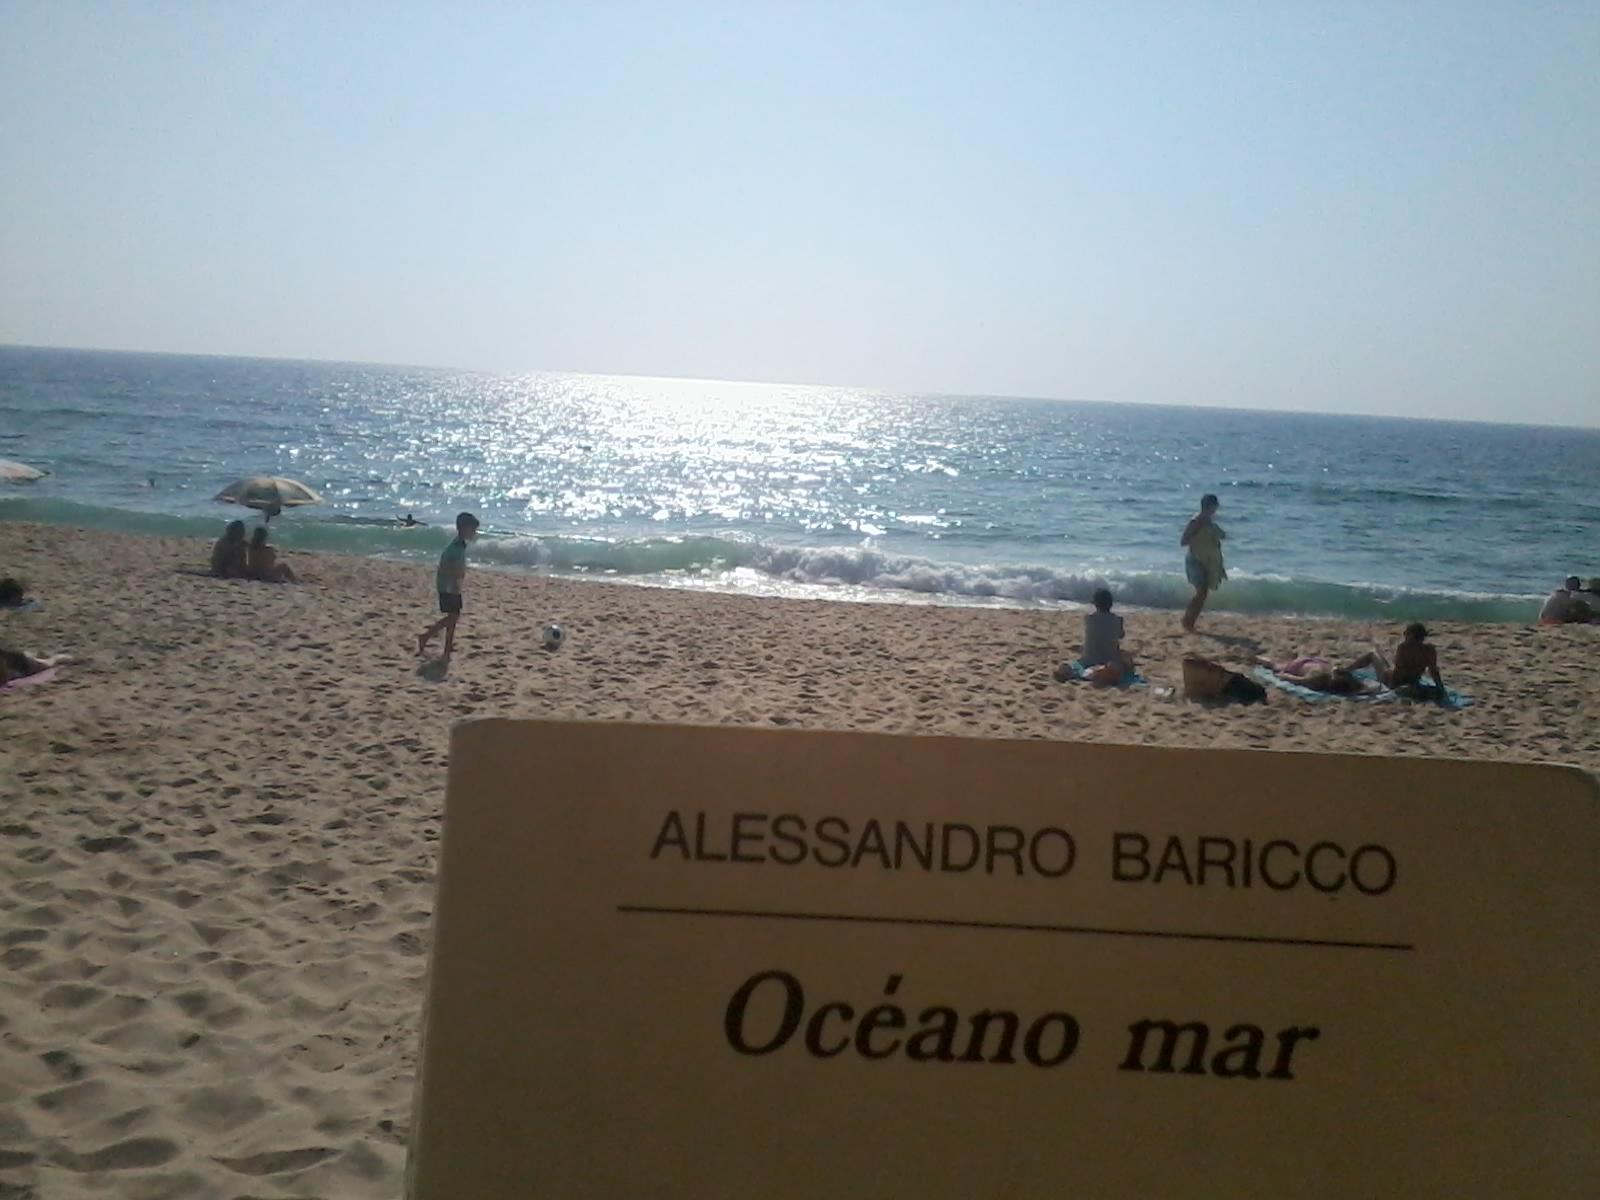 oceanomar